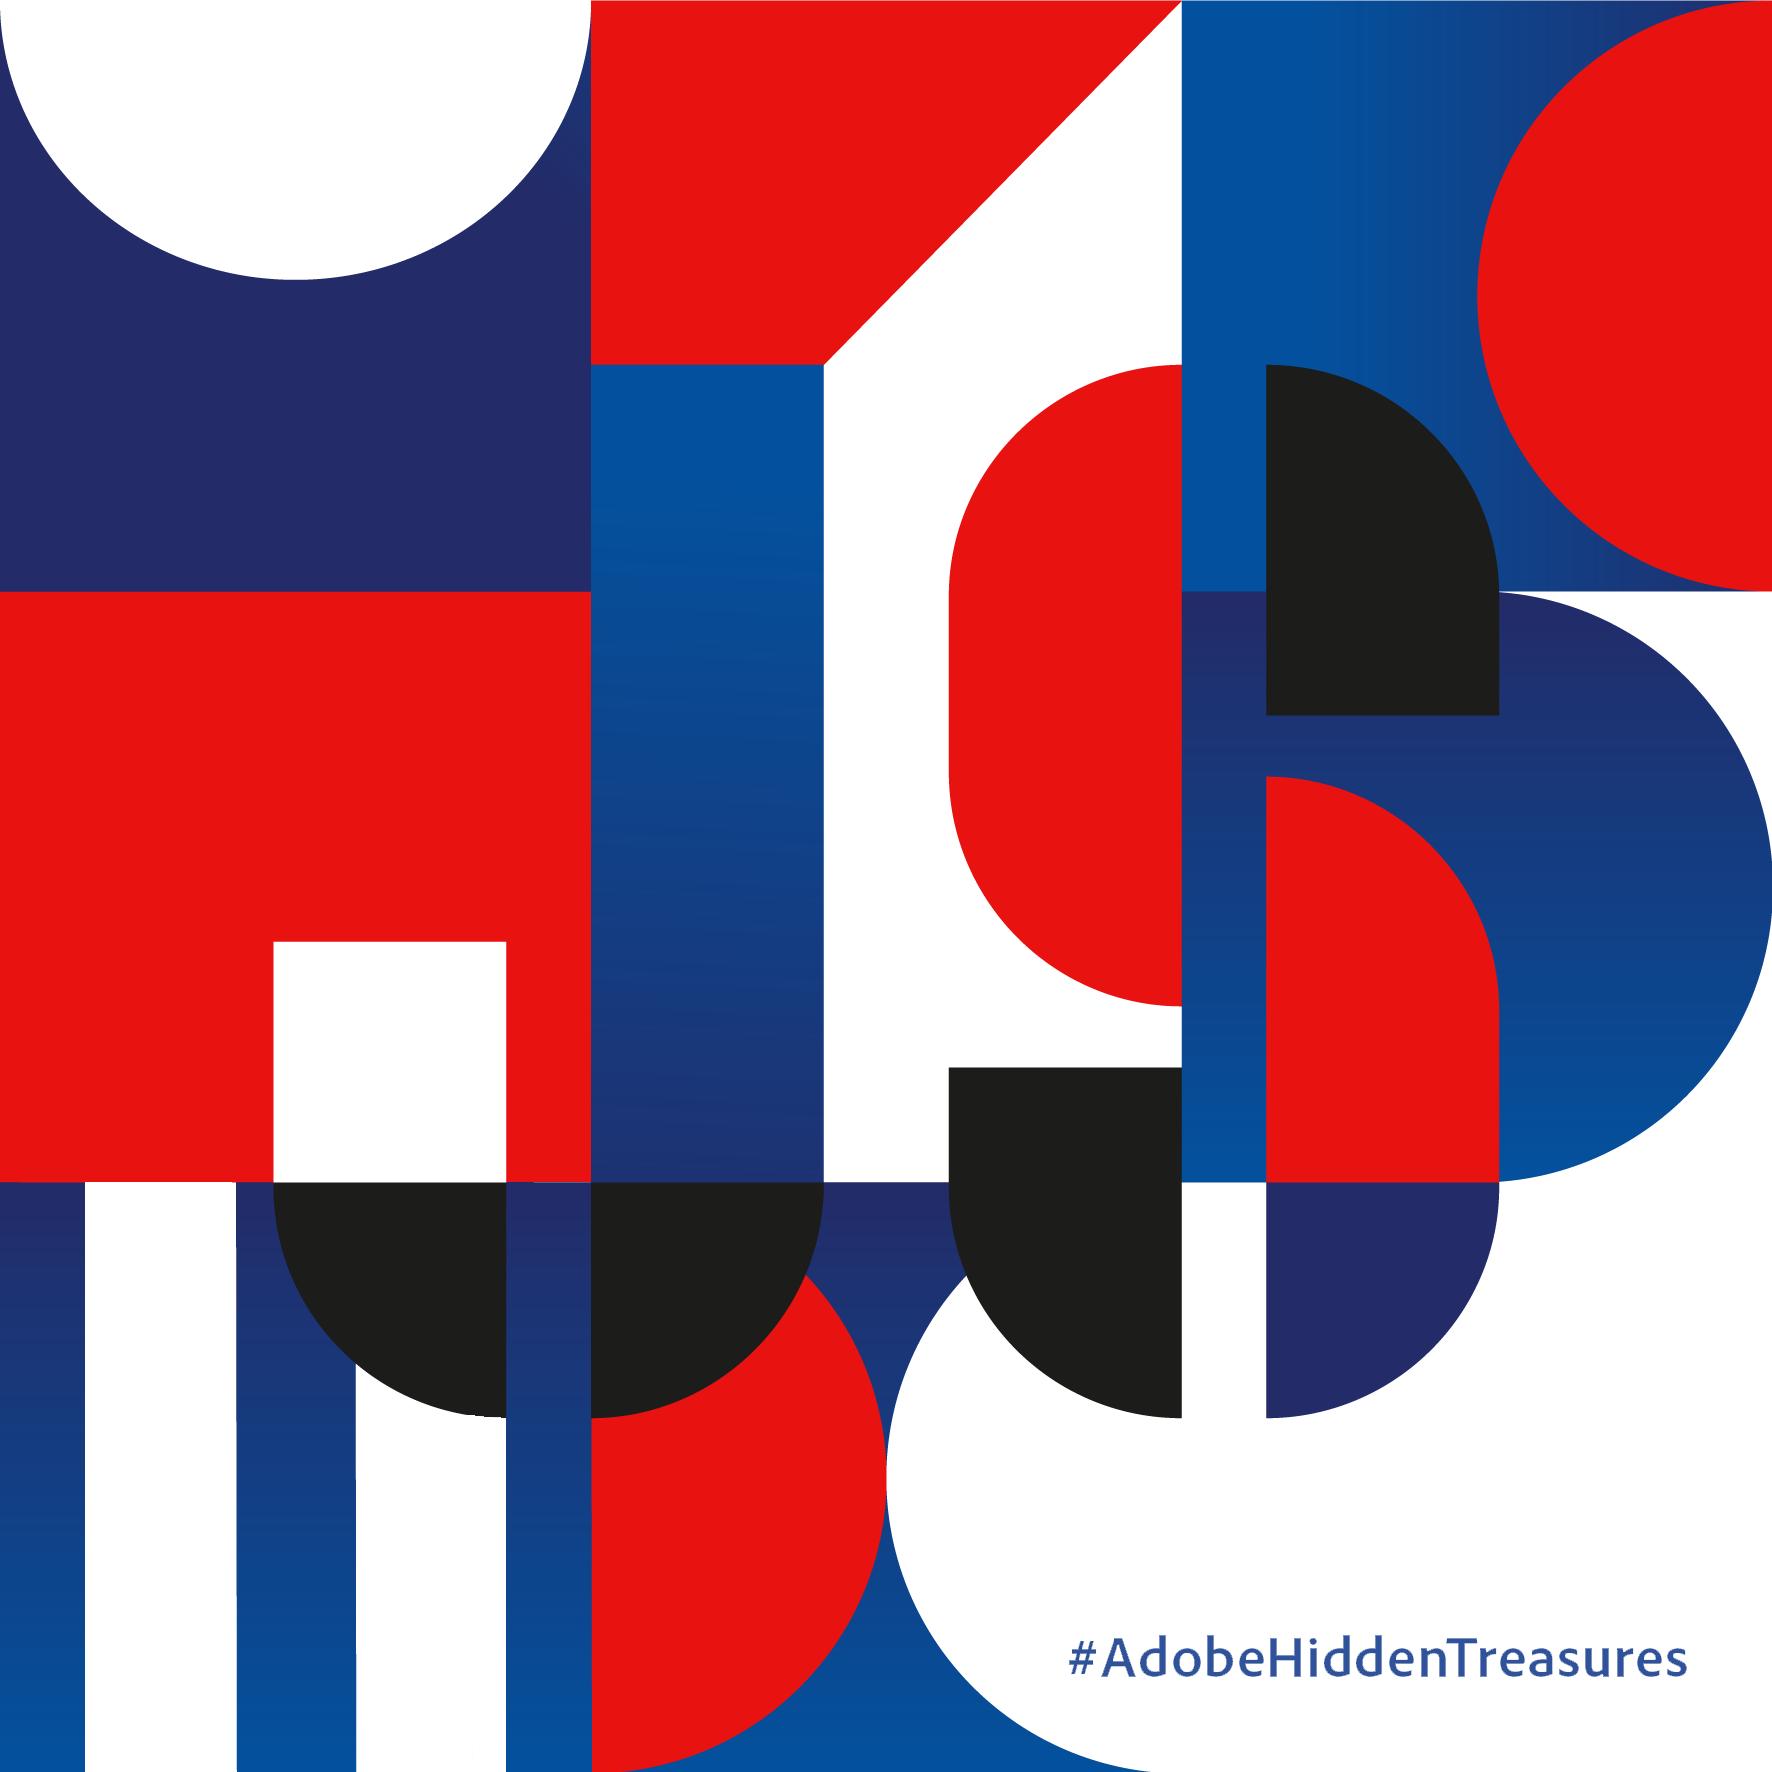 D_Adobe-HiddenTreasures-Palma-Typejockeys_JS.png